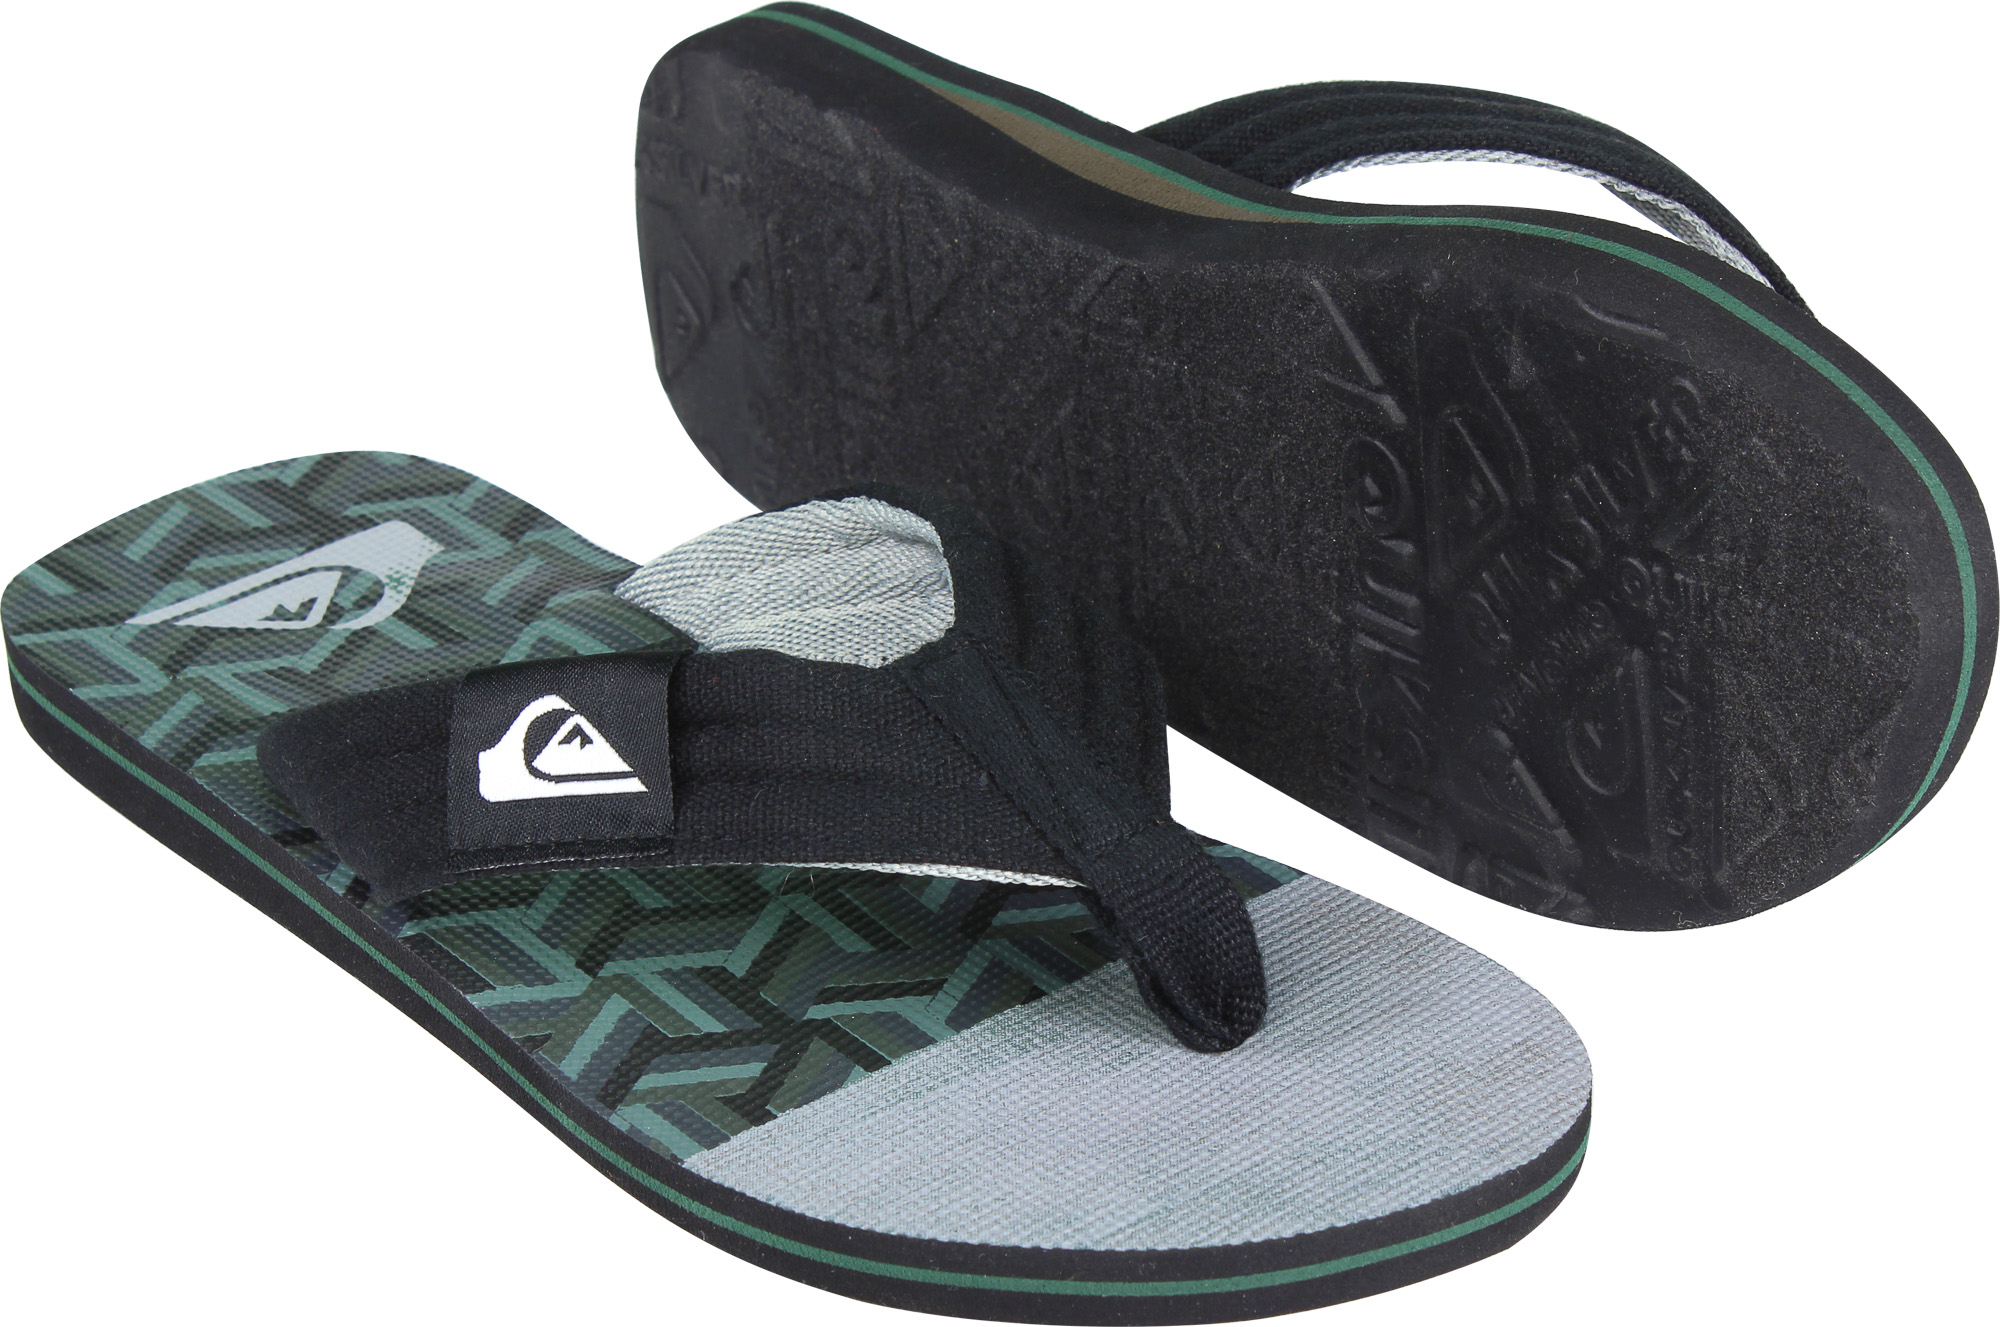 850b3002776b7 Details about Quiksilver Mens Molokai Layback Sandals - Black Green